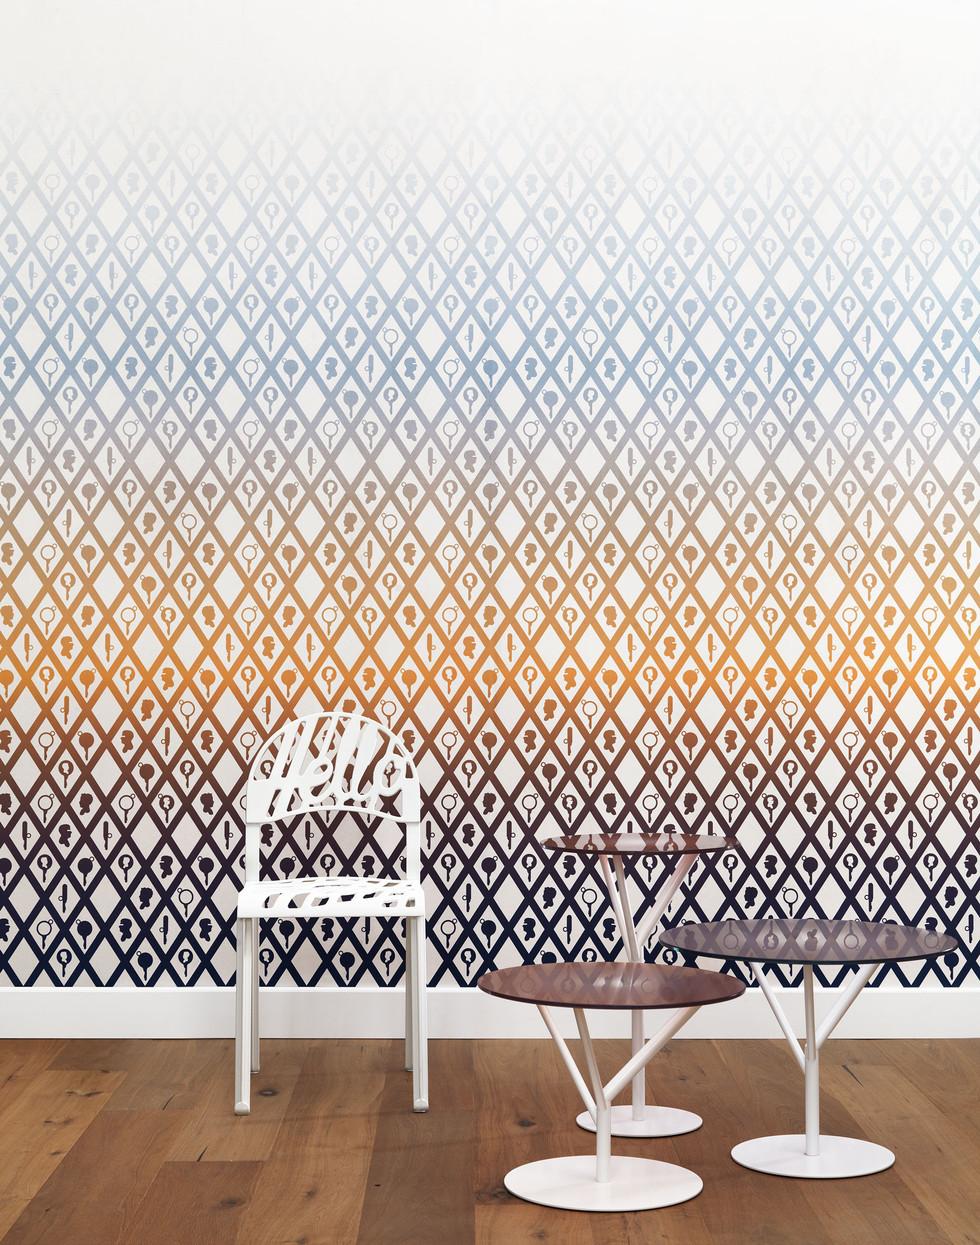 Thomas-Eurlings-Gradient-Wallpaper.jpg